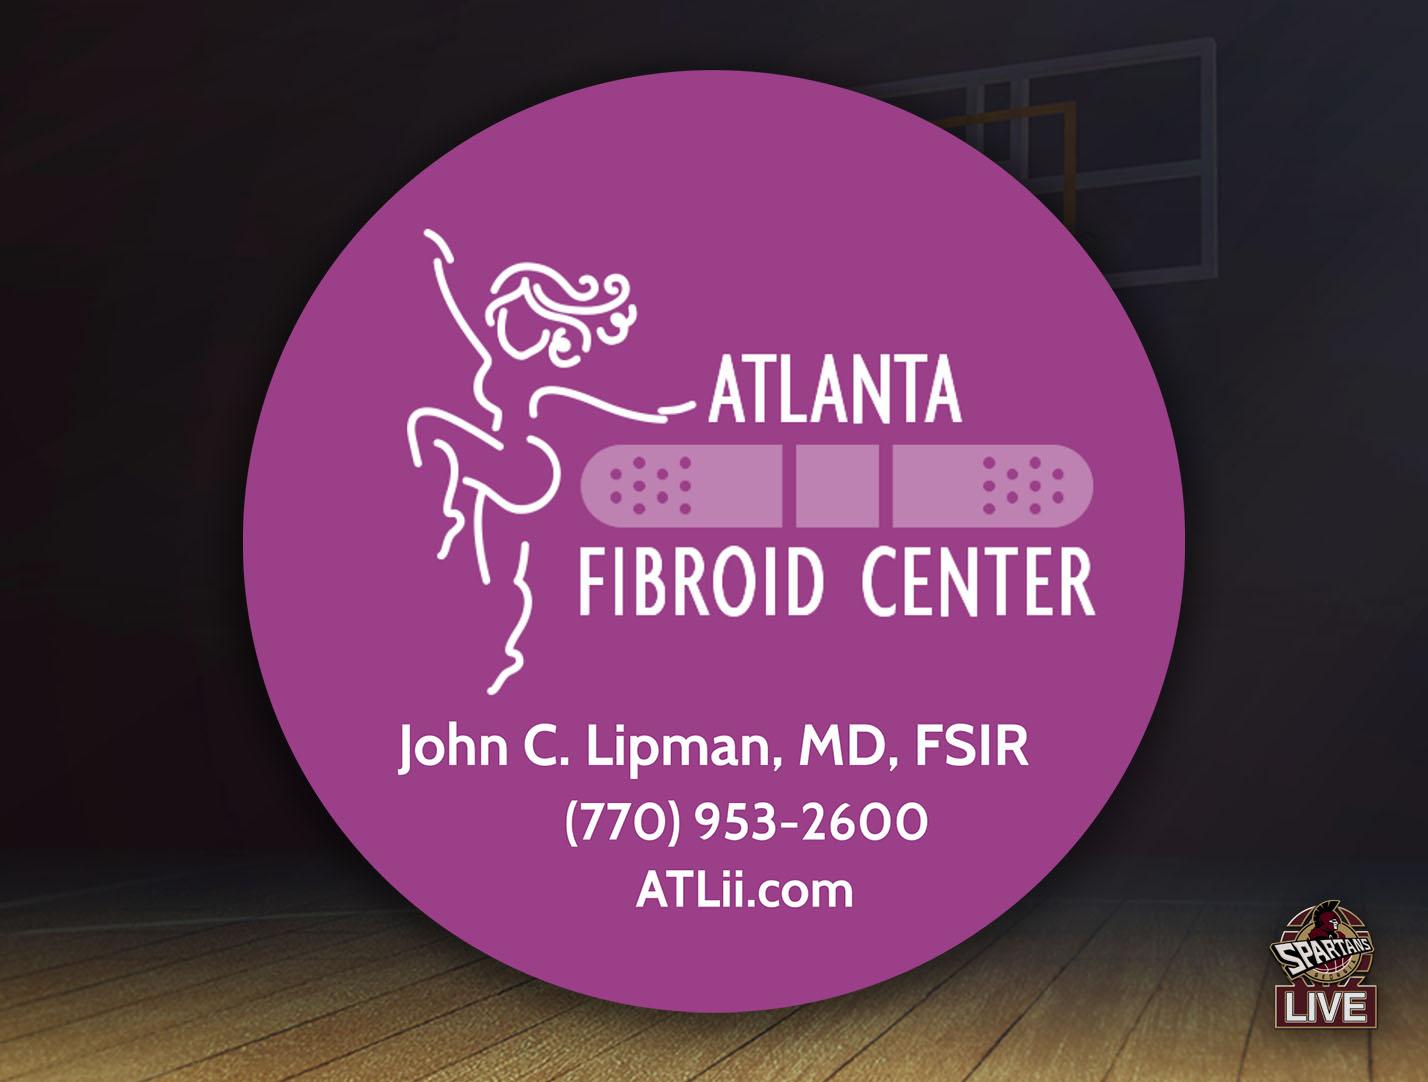 Atlanta Fibroid Center Georgia Spartans Team Sponsor